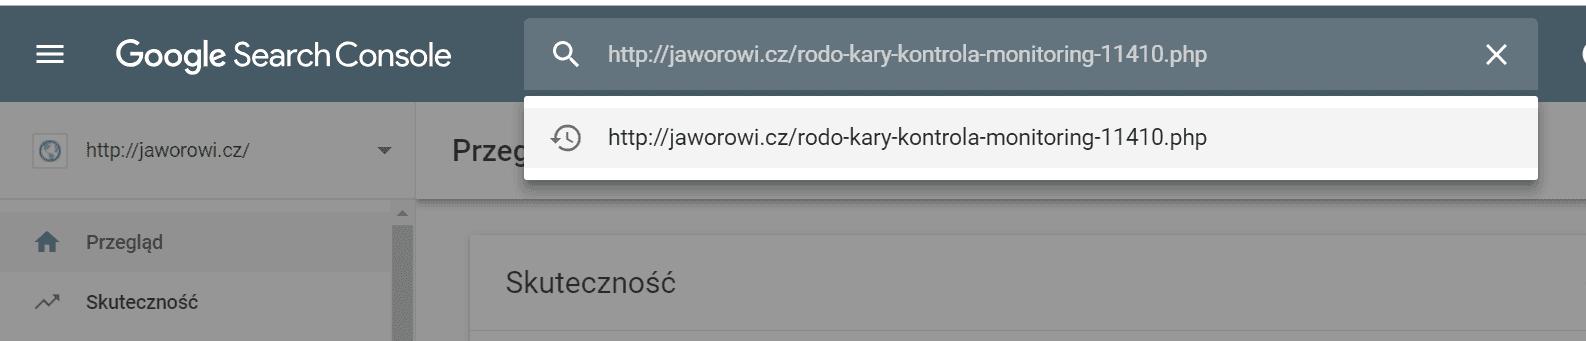 konsola google zaindeksuj stronę